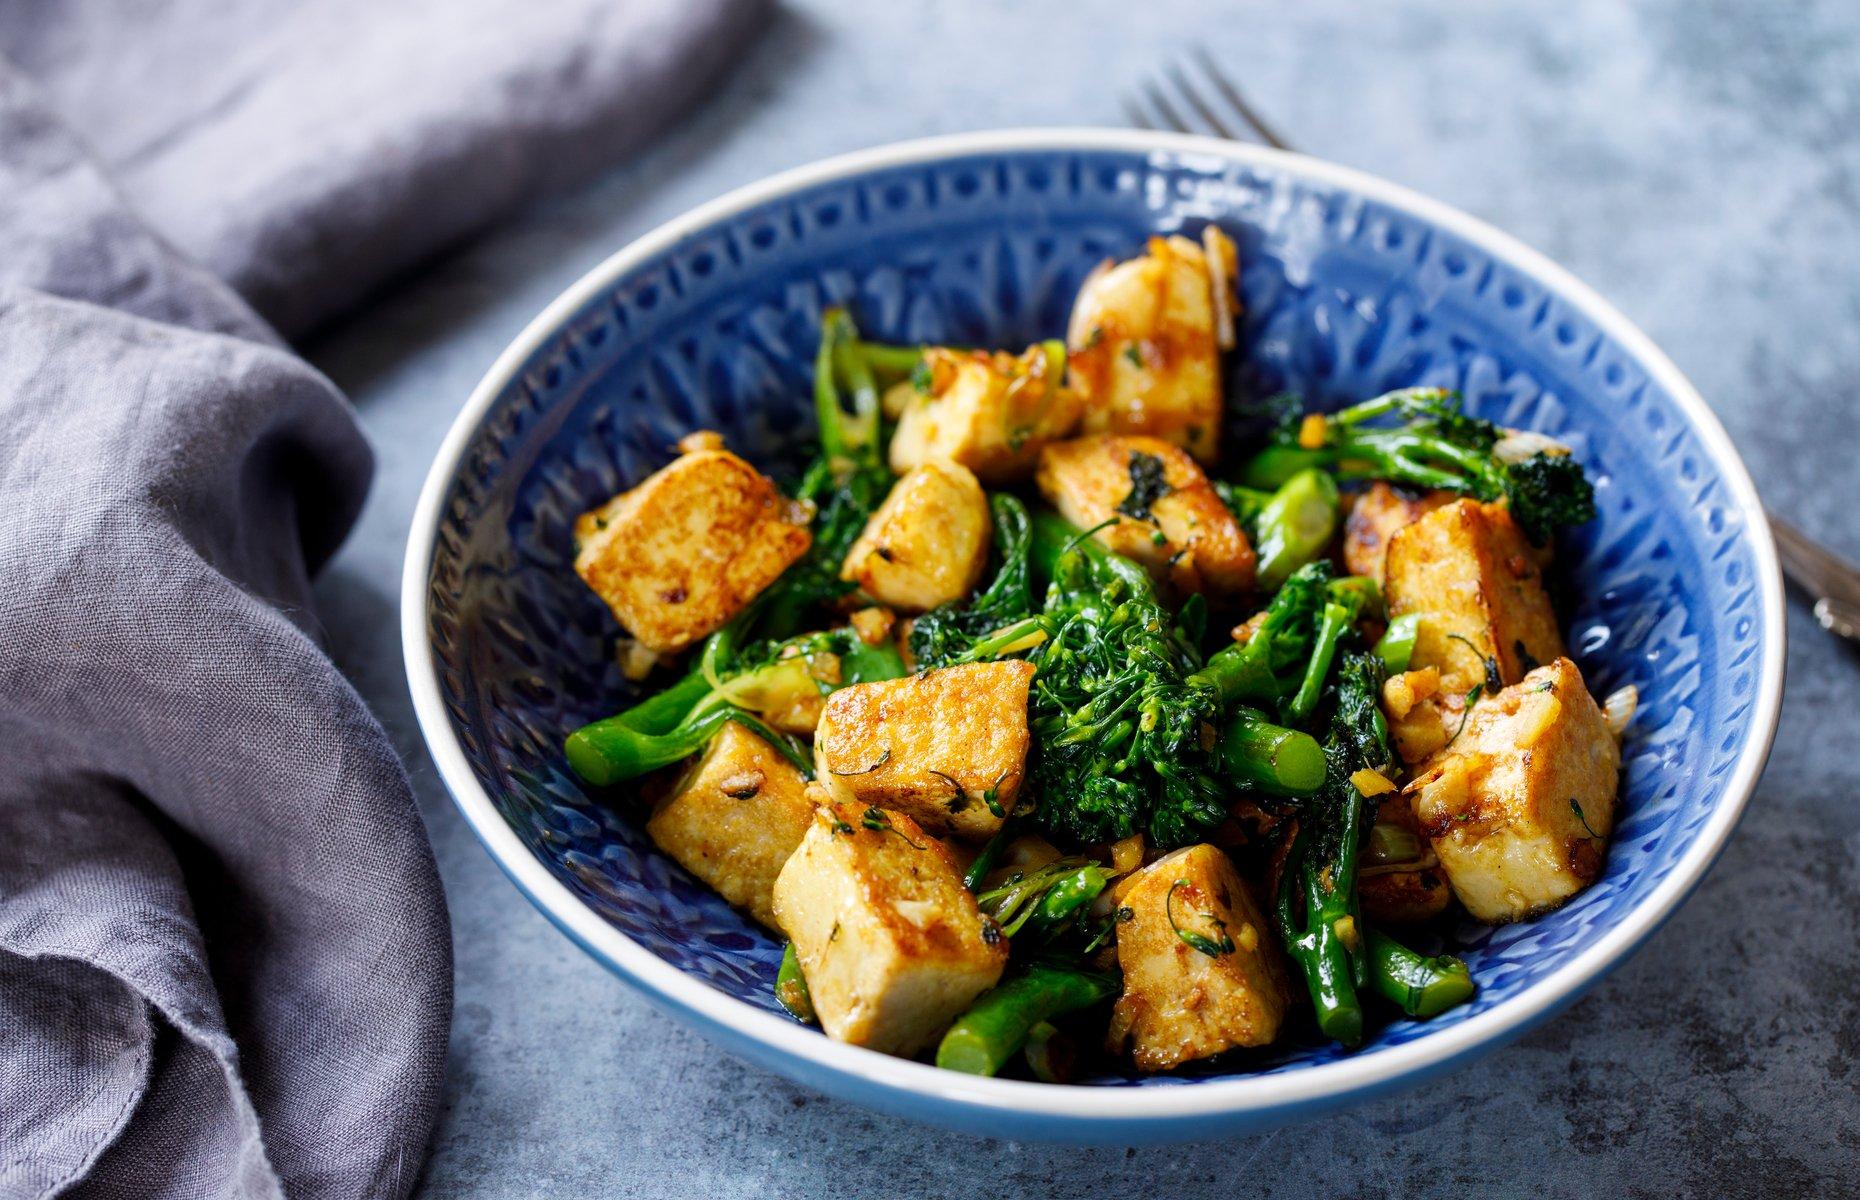 Tofu: Health Benefits of This Vegan Superfood